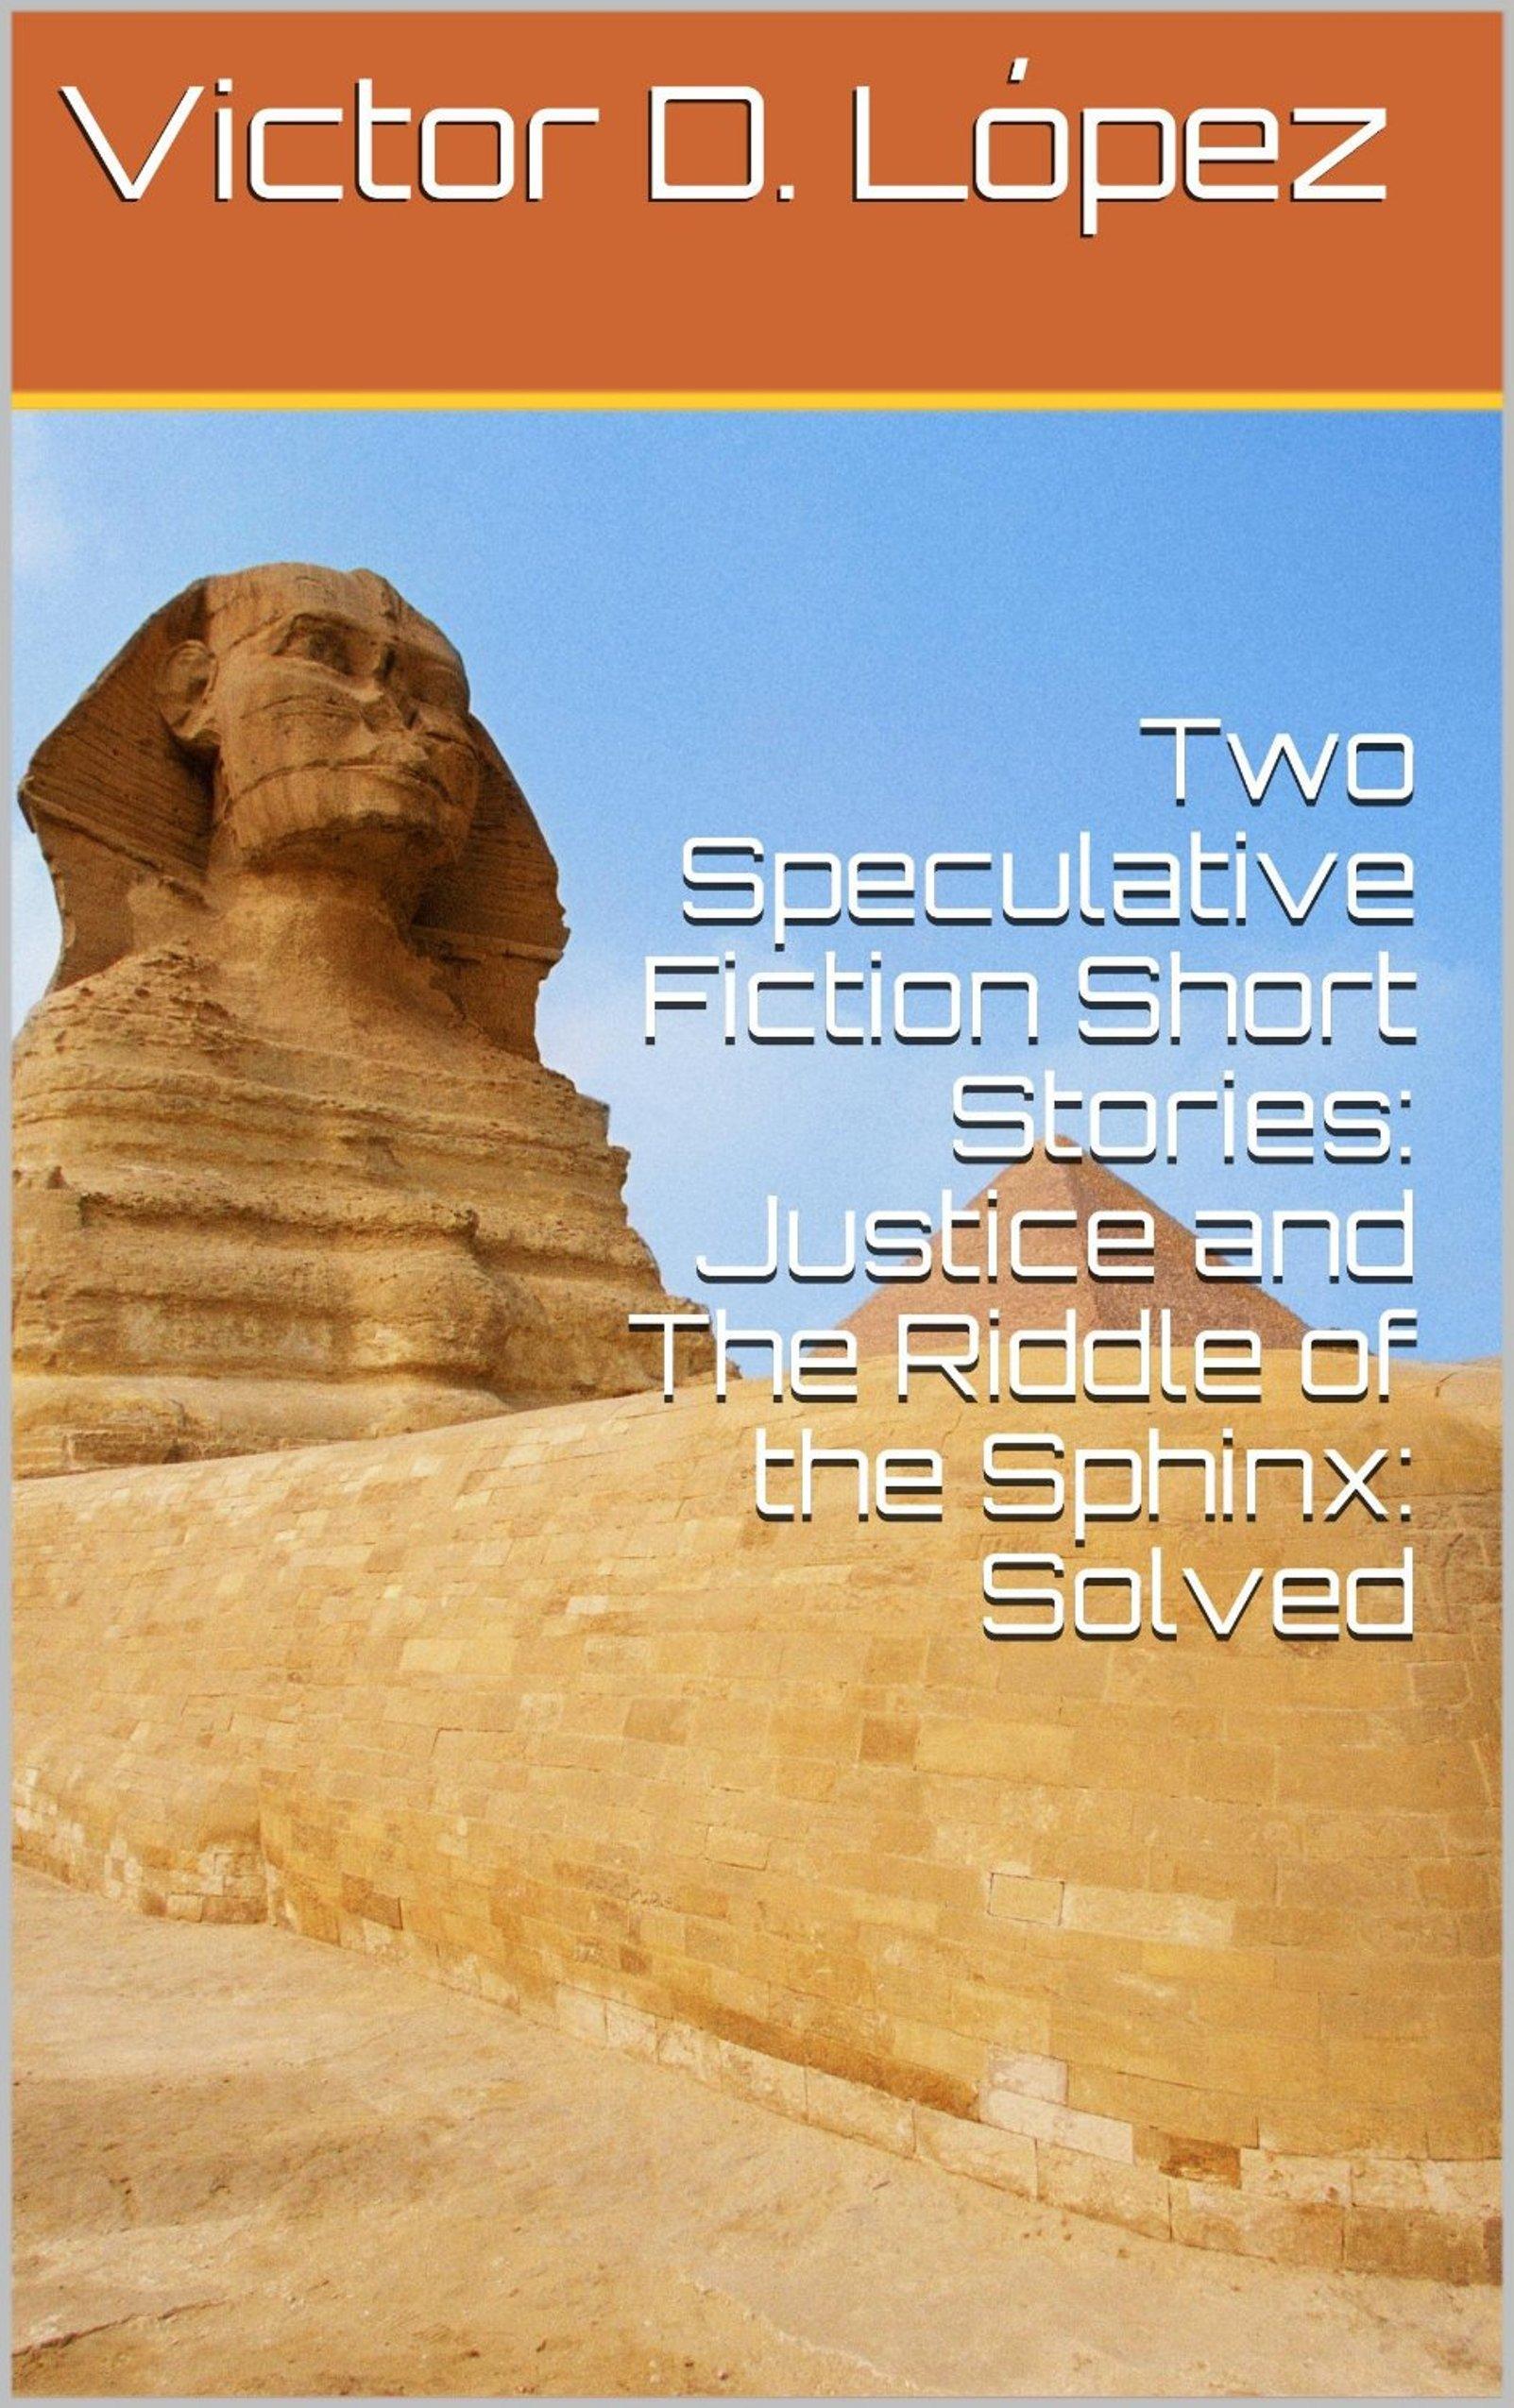 Two speculative fiction short stories free -- through 11/30 899d5d00236d6a8aa0fca48c91da9028ab6c9ef2